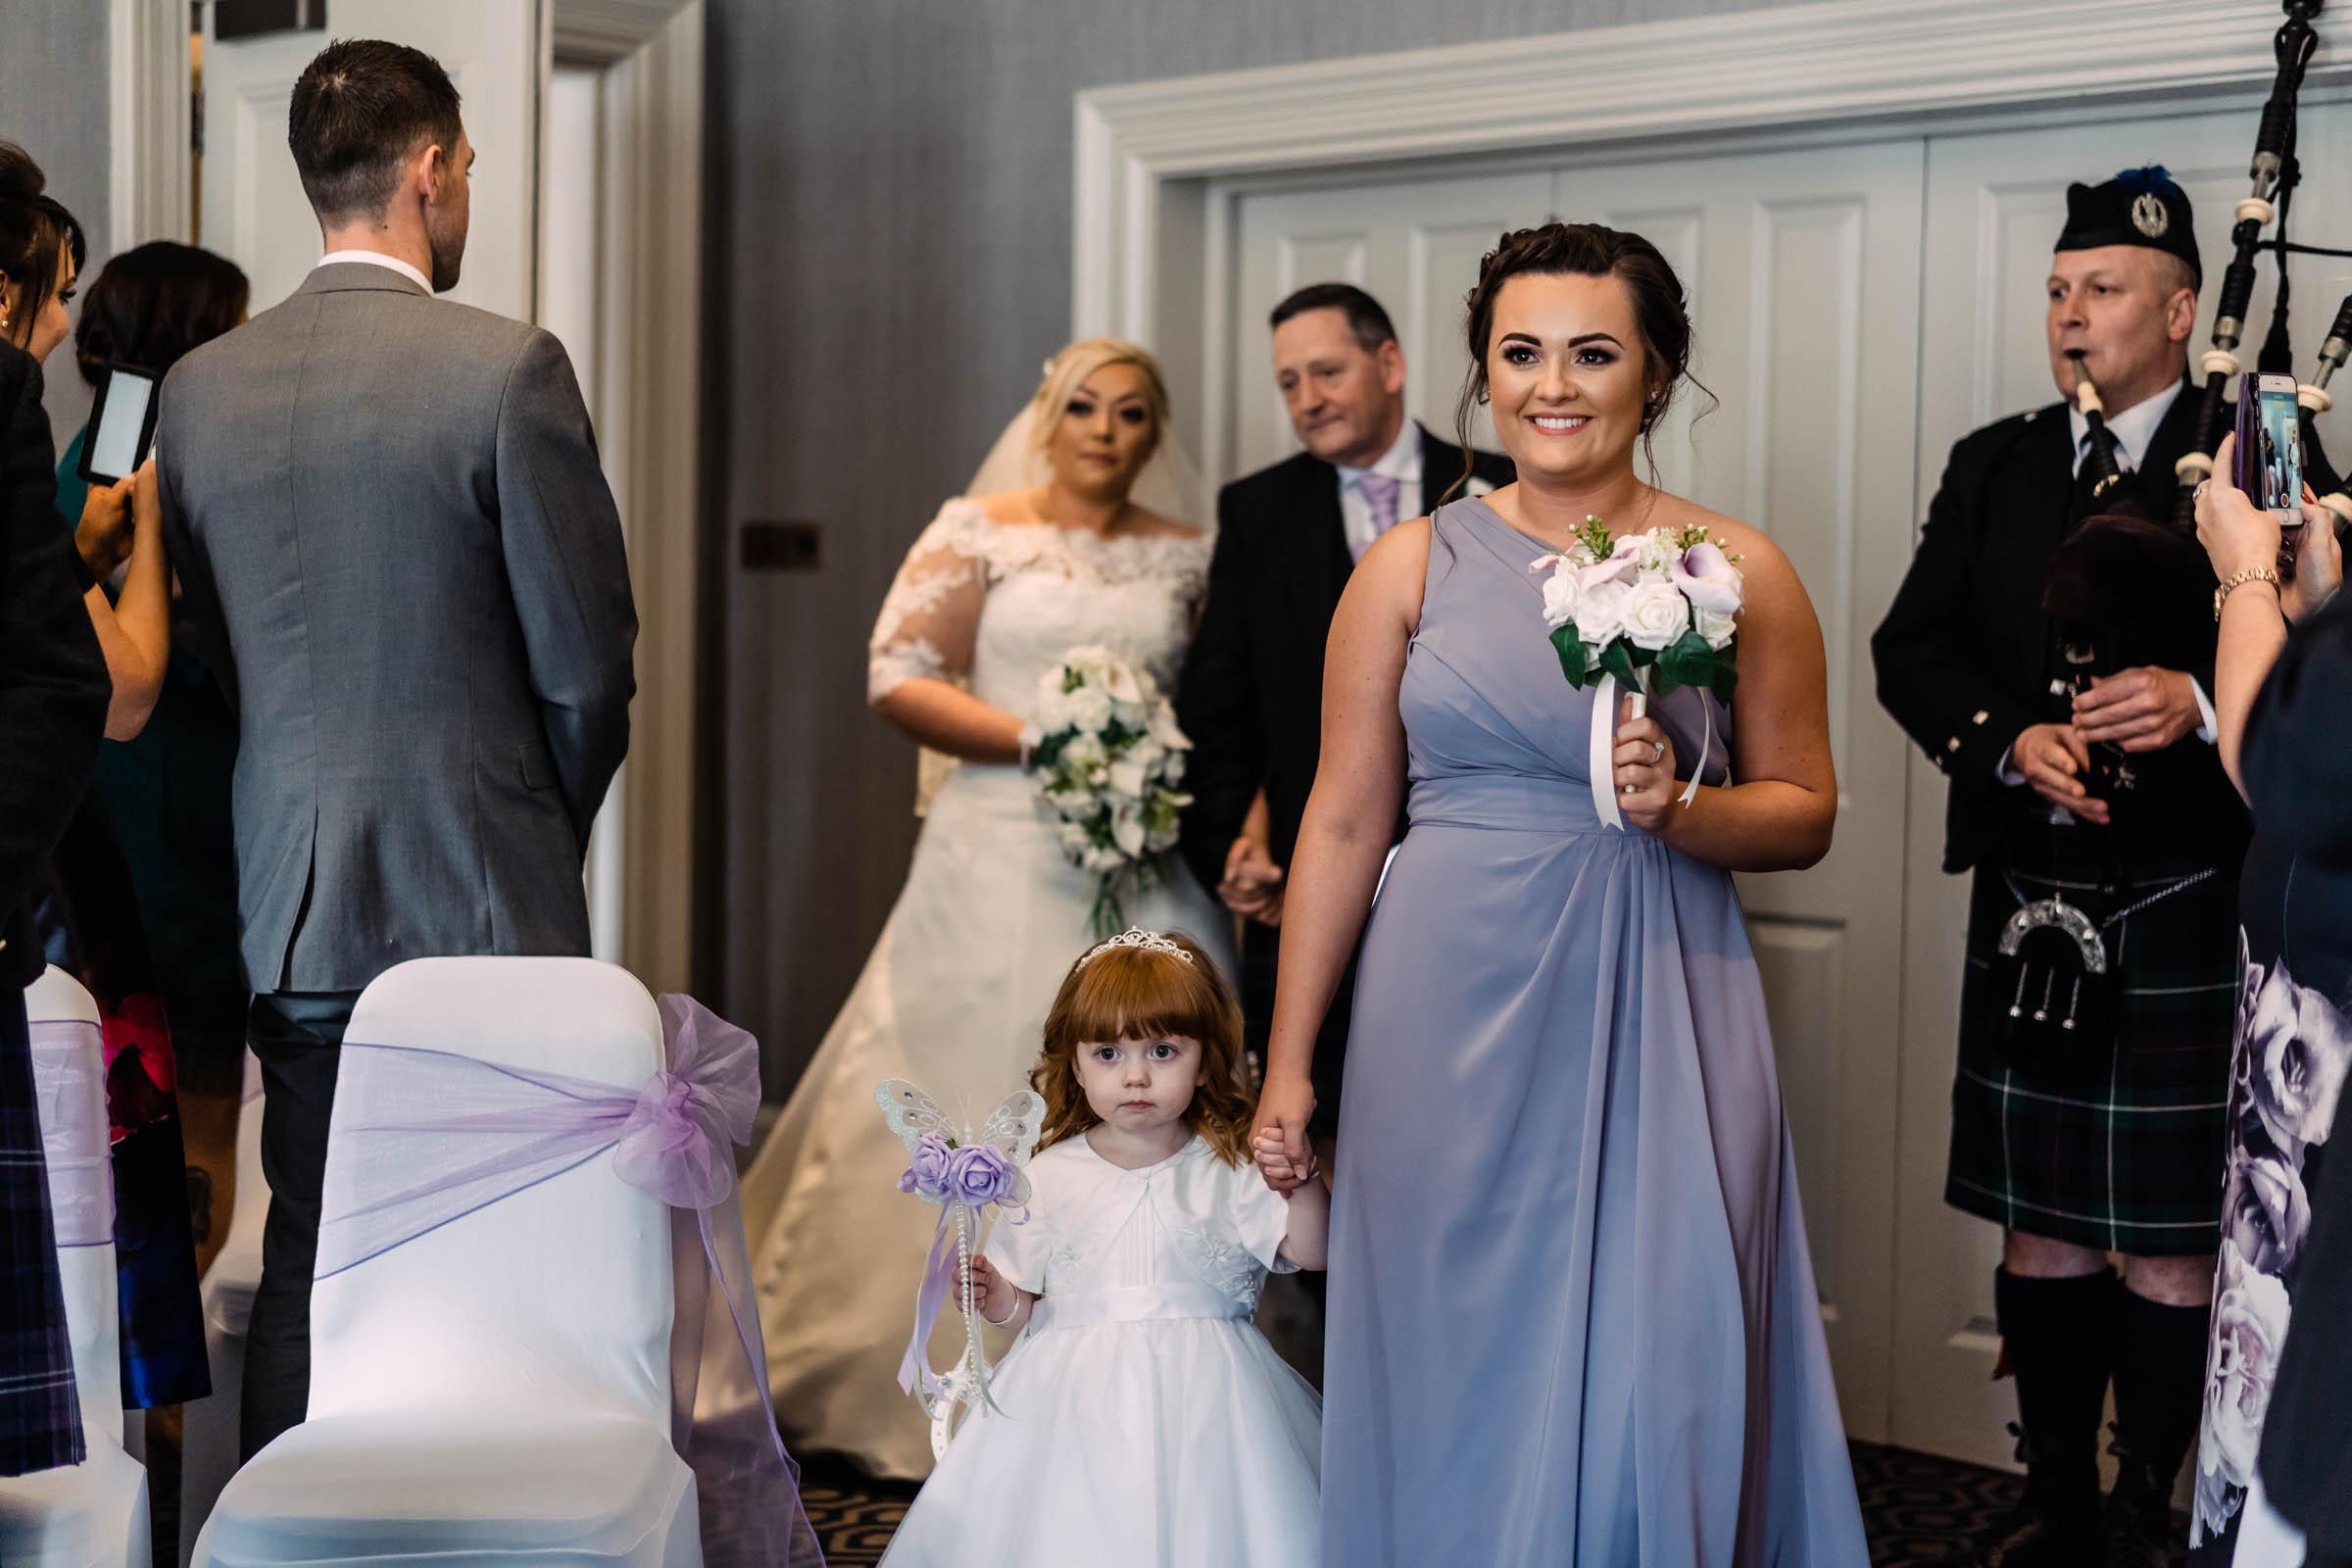 motherwell-moorings-wedding-photographer-dearlyphotography (30 of 77).jpg